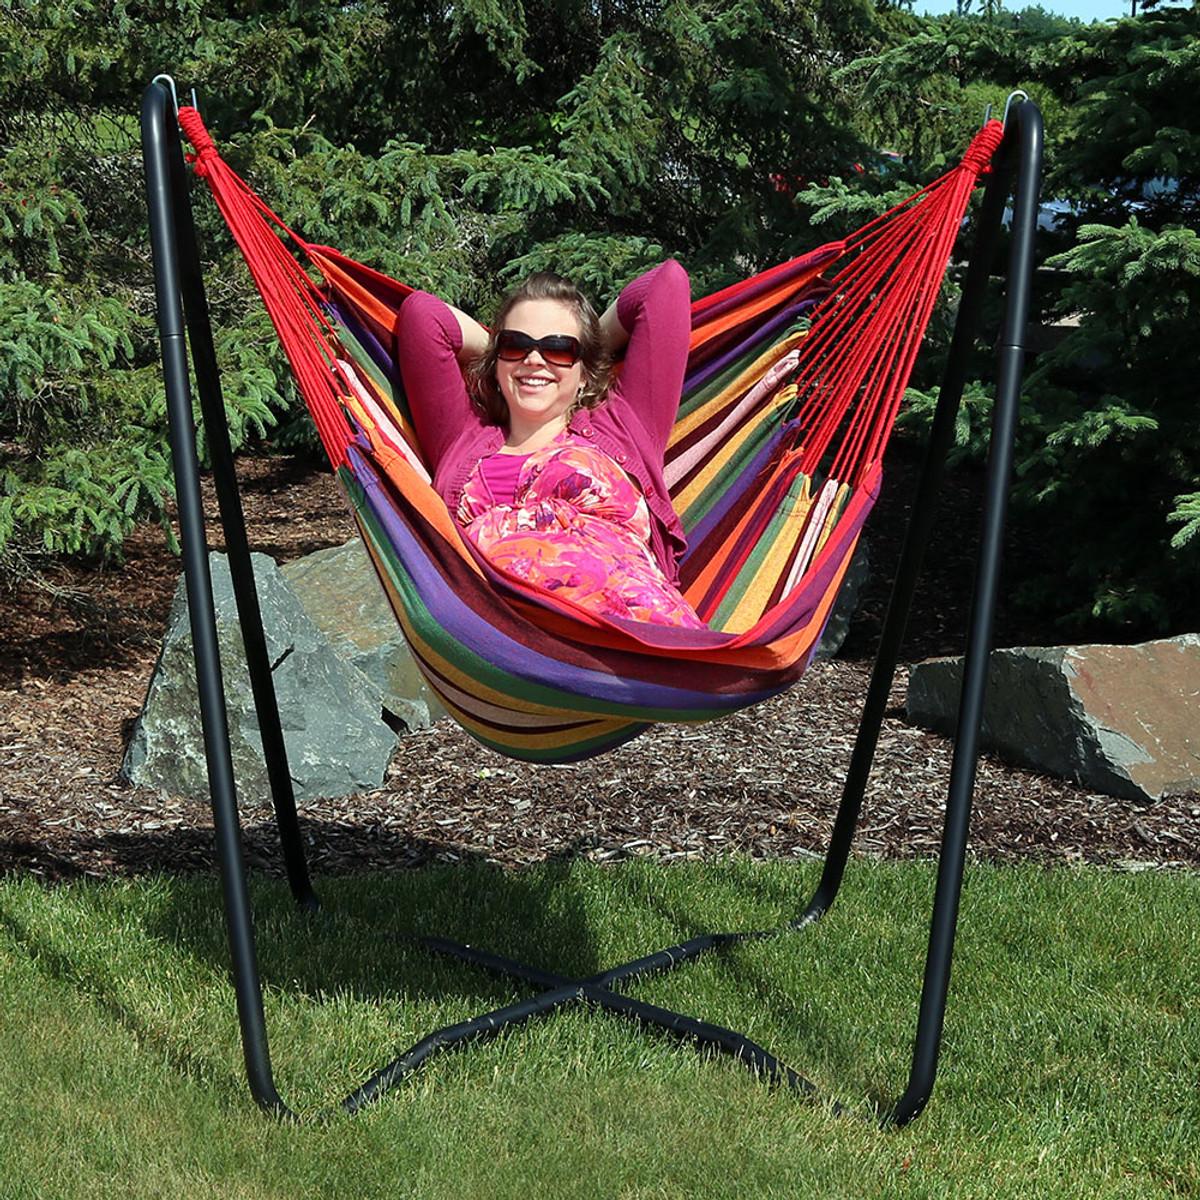 Sunnydaze Indoor-Outdoor Hanging Hammock Chair Swing and X-Stand Set Oasis